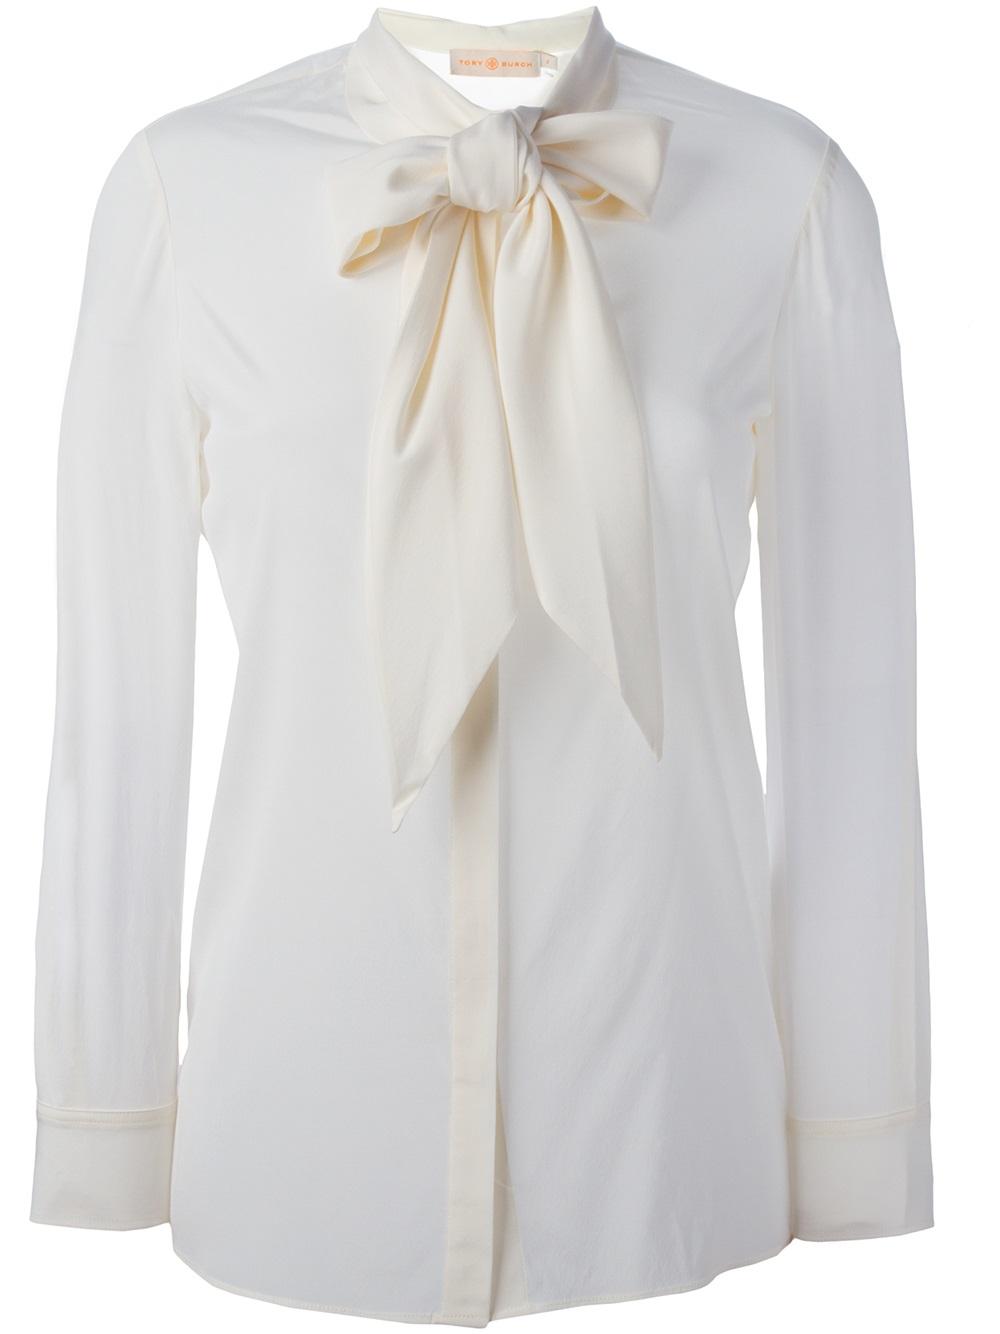 Lyst Tory Burch Silk Tie Blouse In White